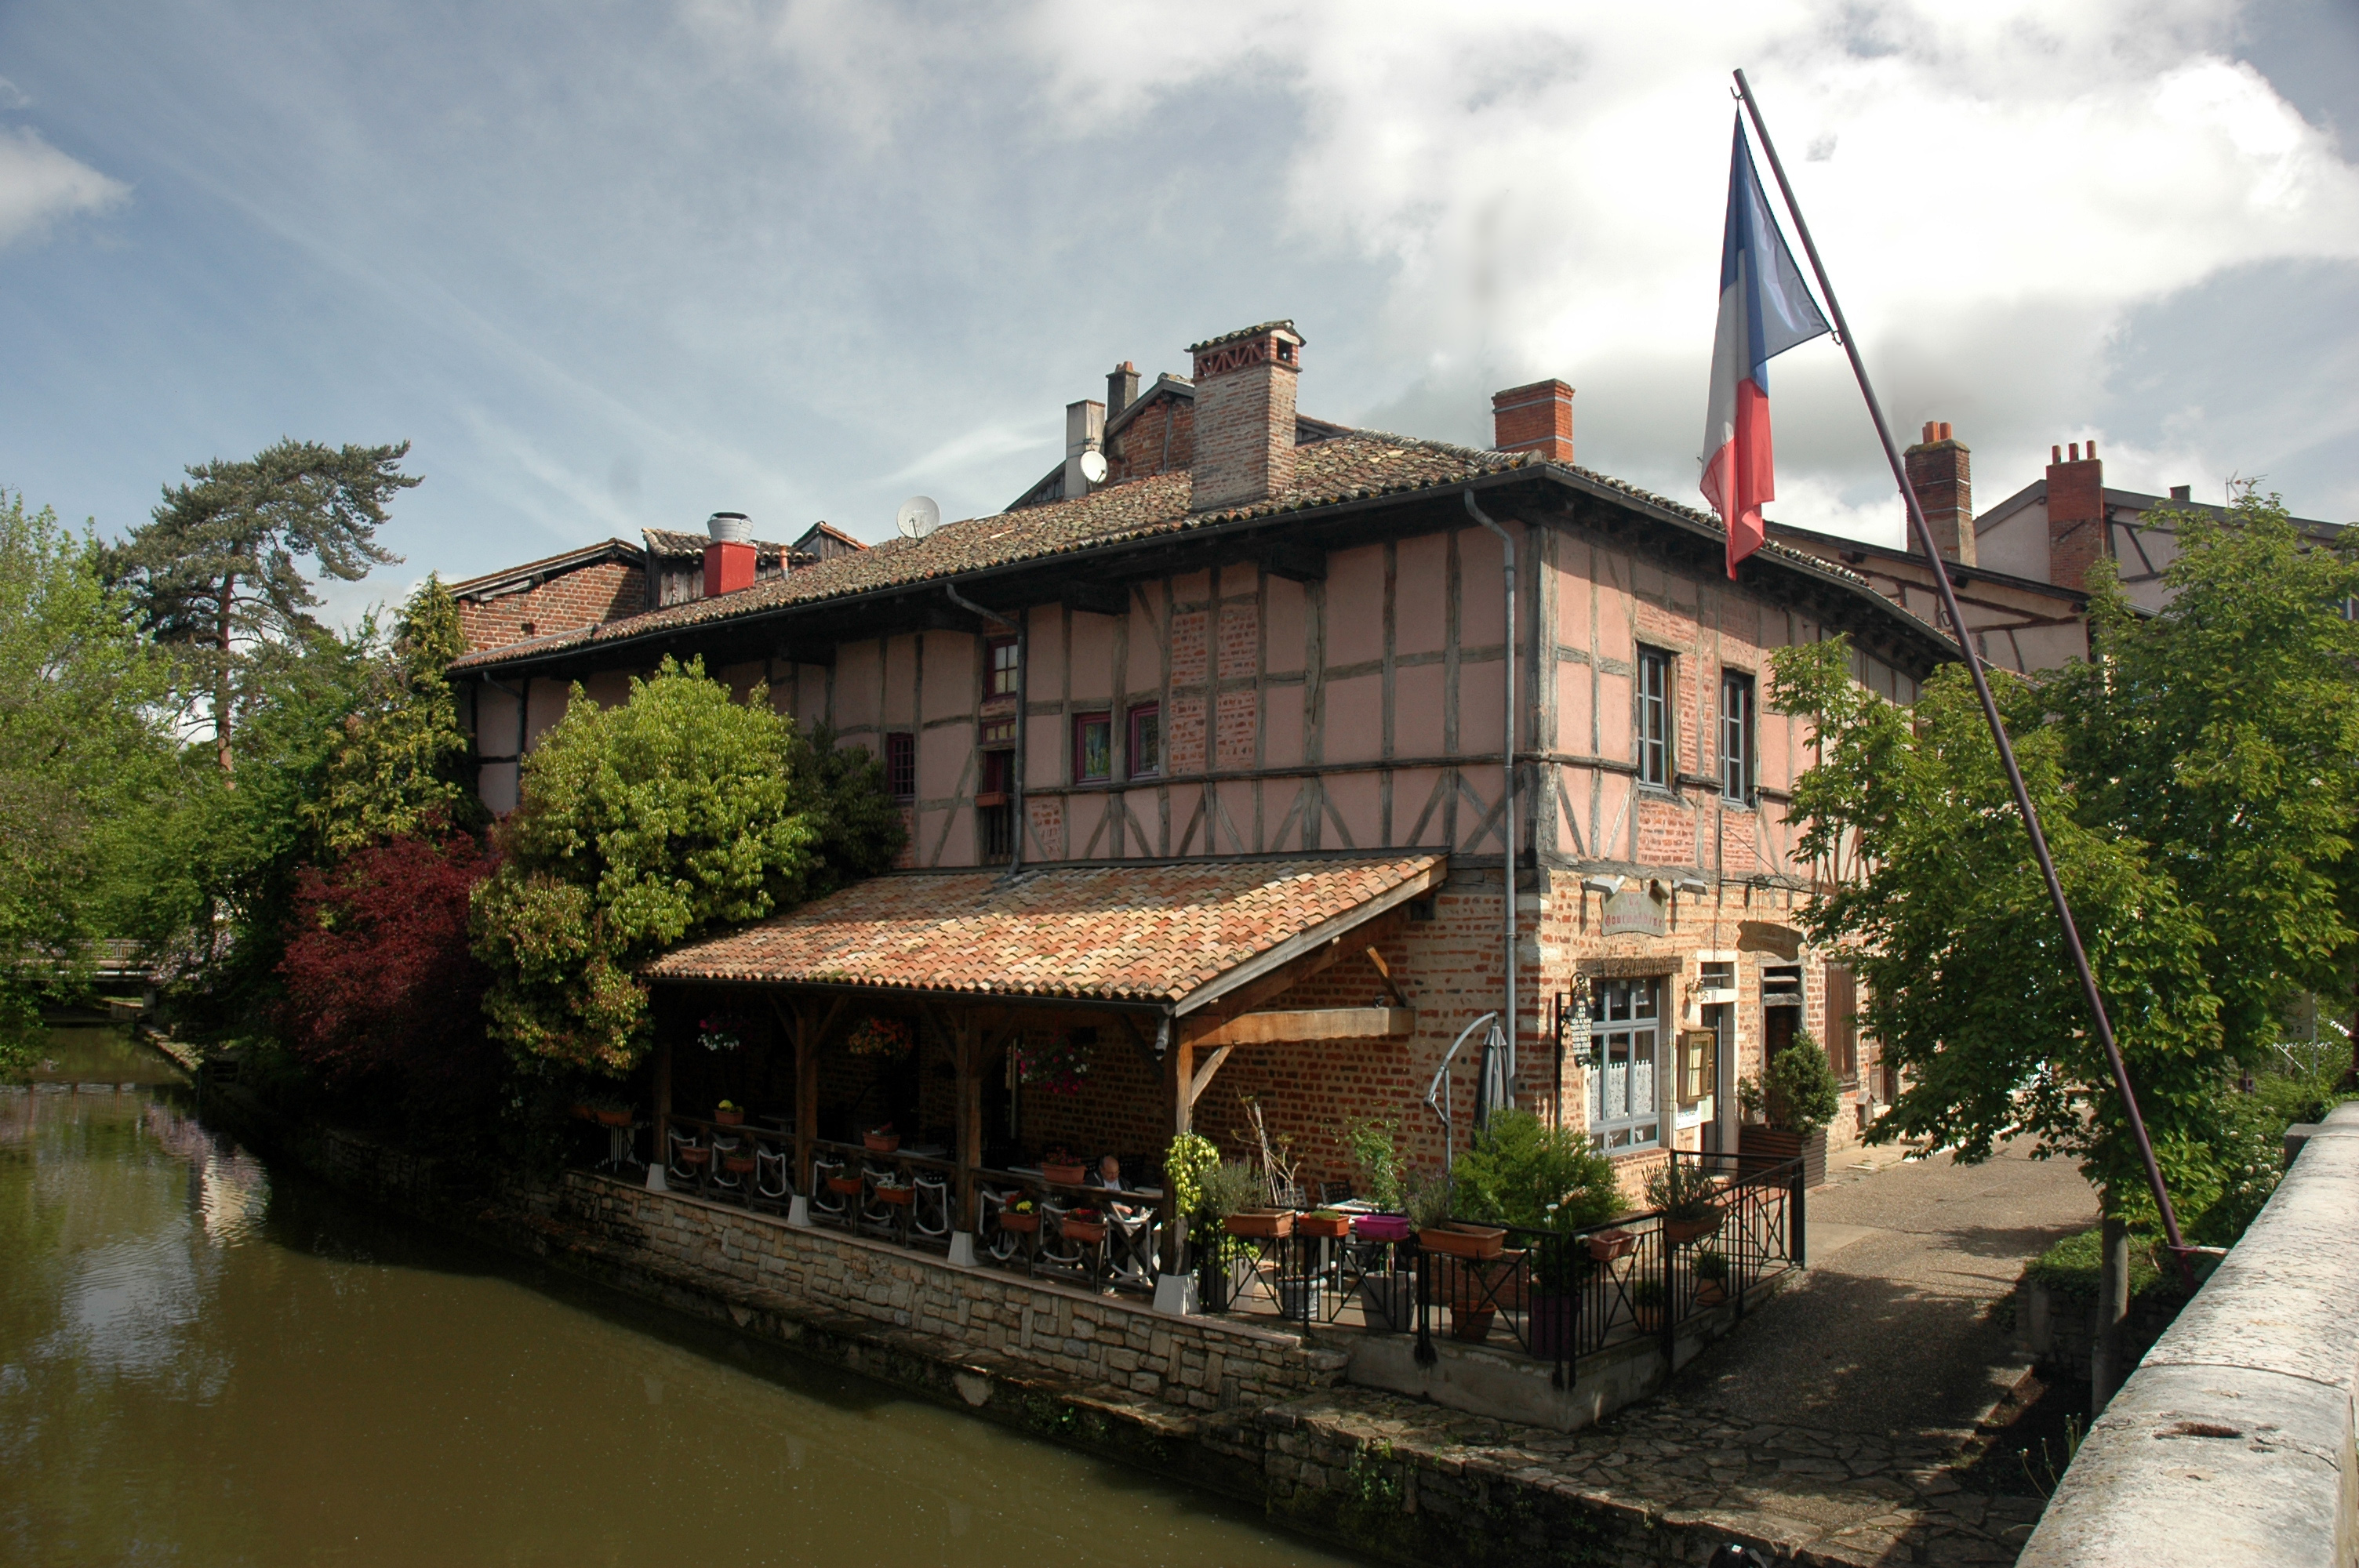 https://upload.wikimedia.org/wikipedia/commons/f/ff/France_ARA_01_Chatillon_sur_Chalaronne_02.jpg